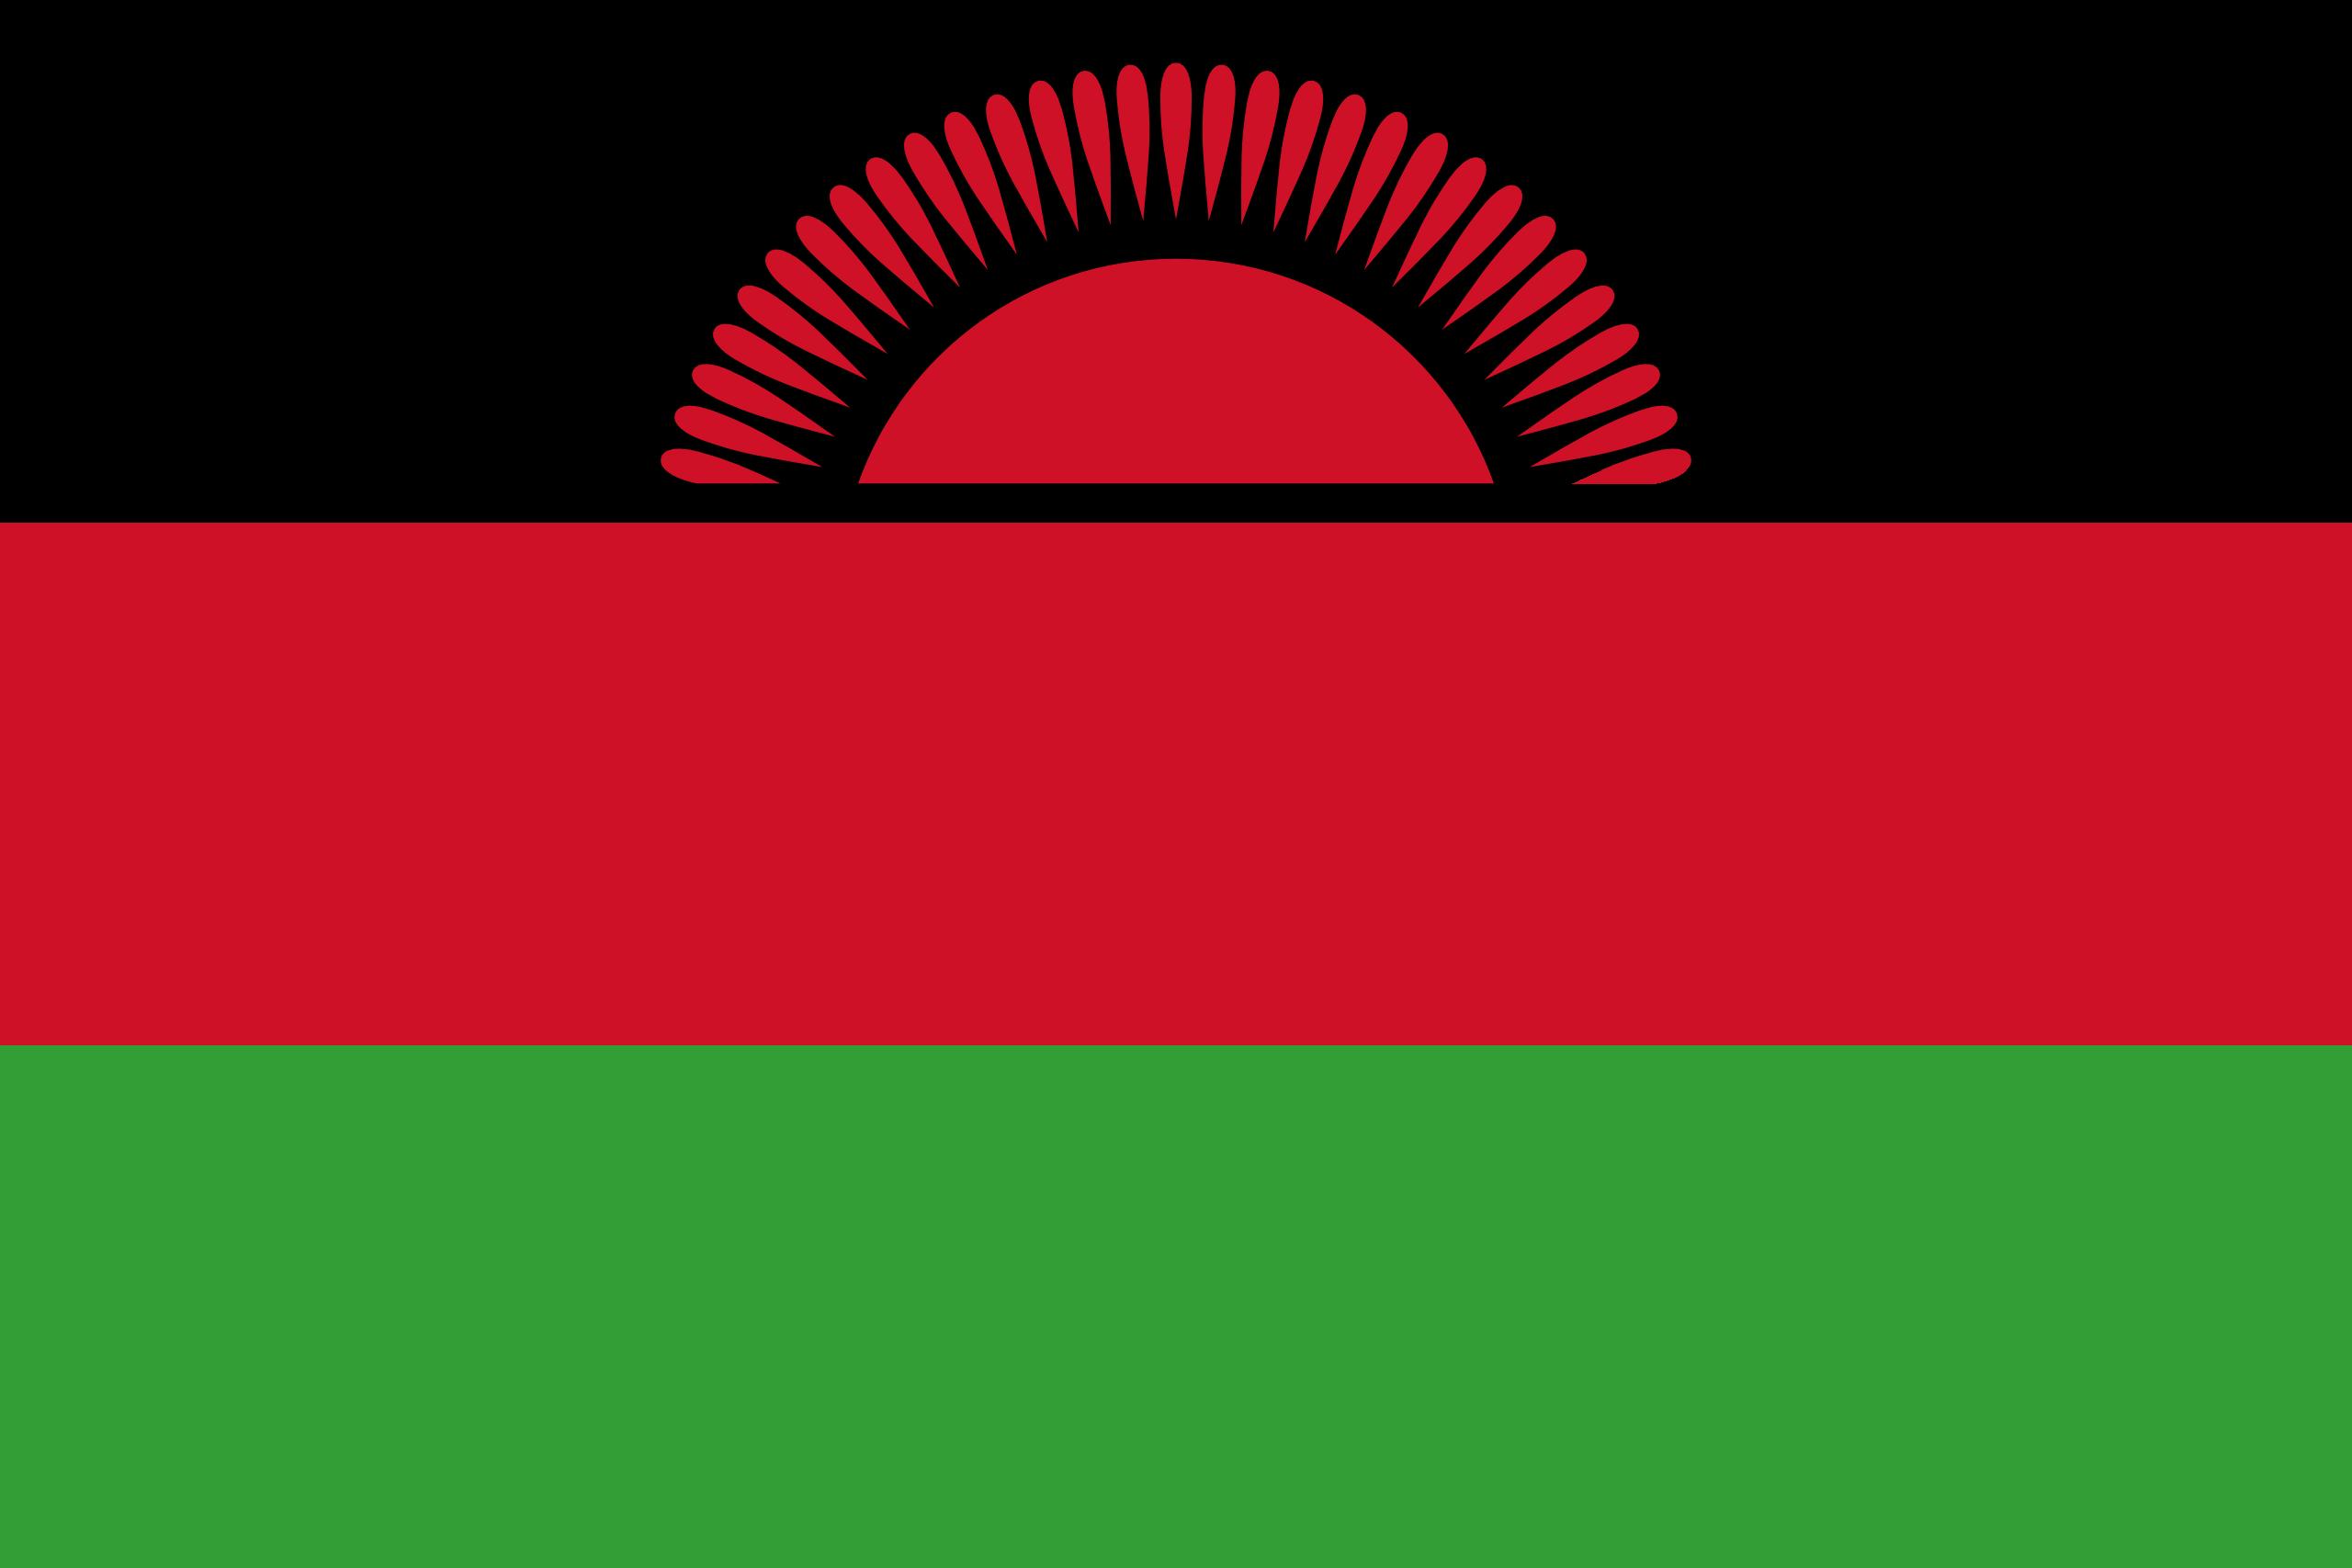 malawi, страна, Эмблема, логотип, символ - Обои HD - Профессор falken.com